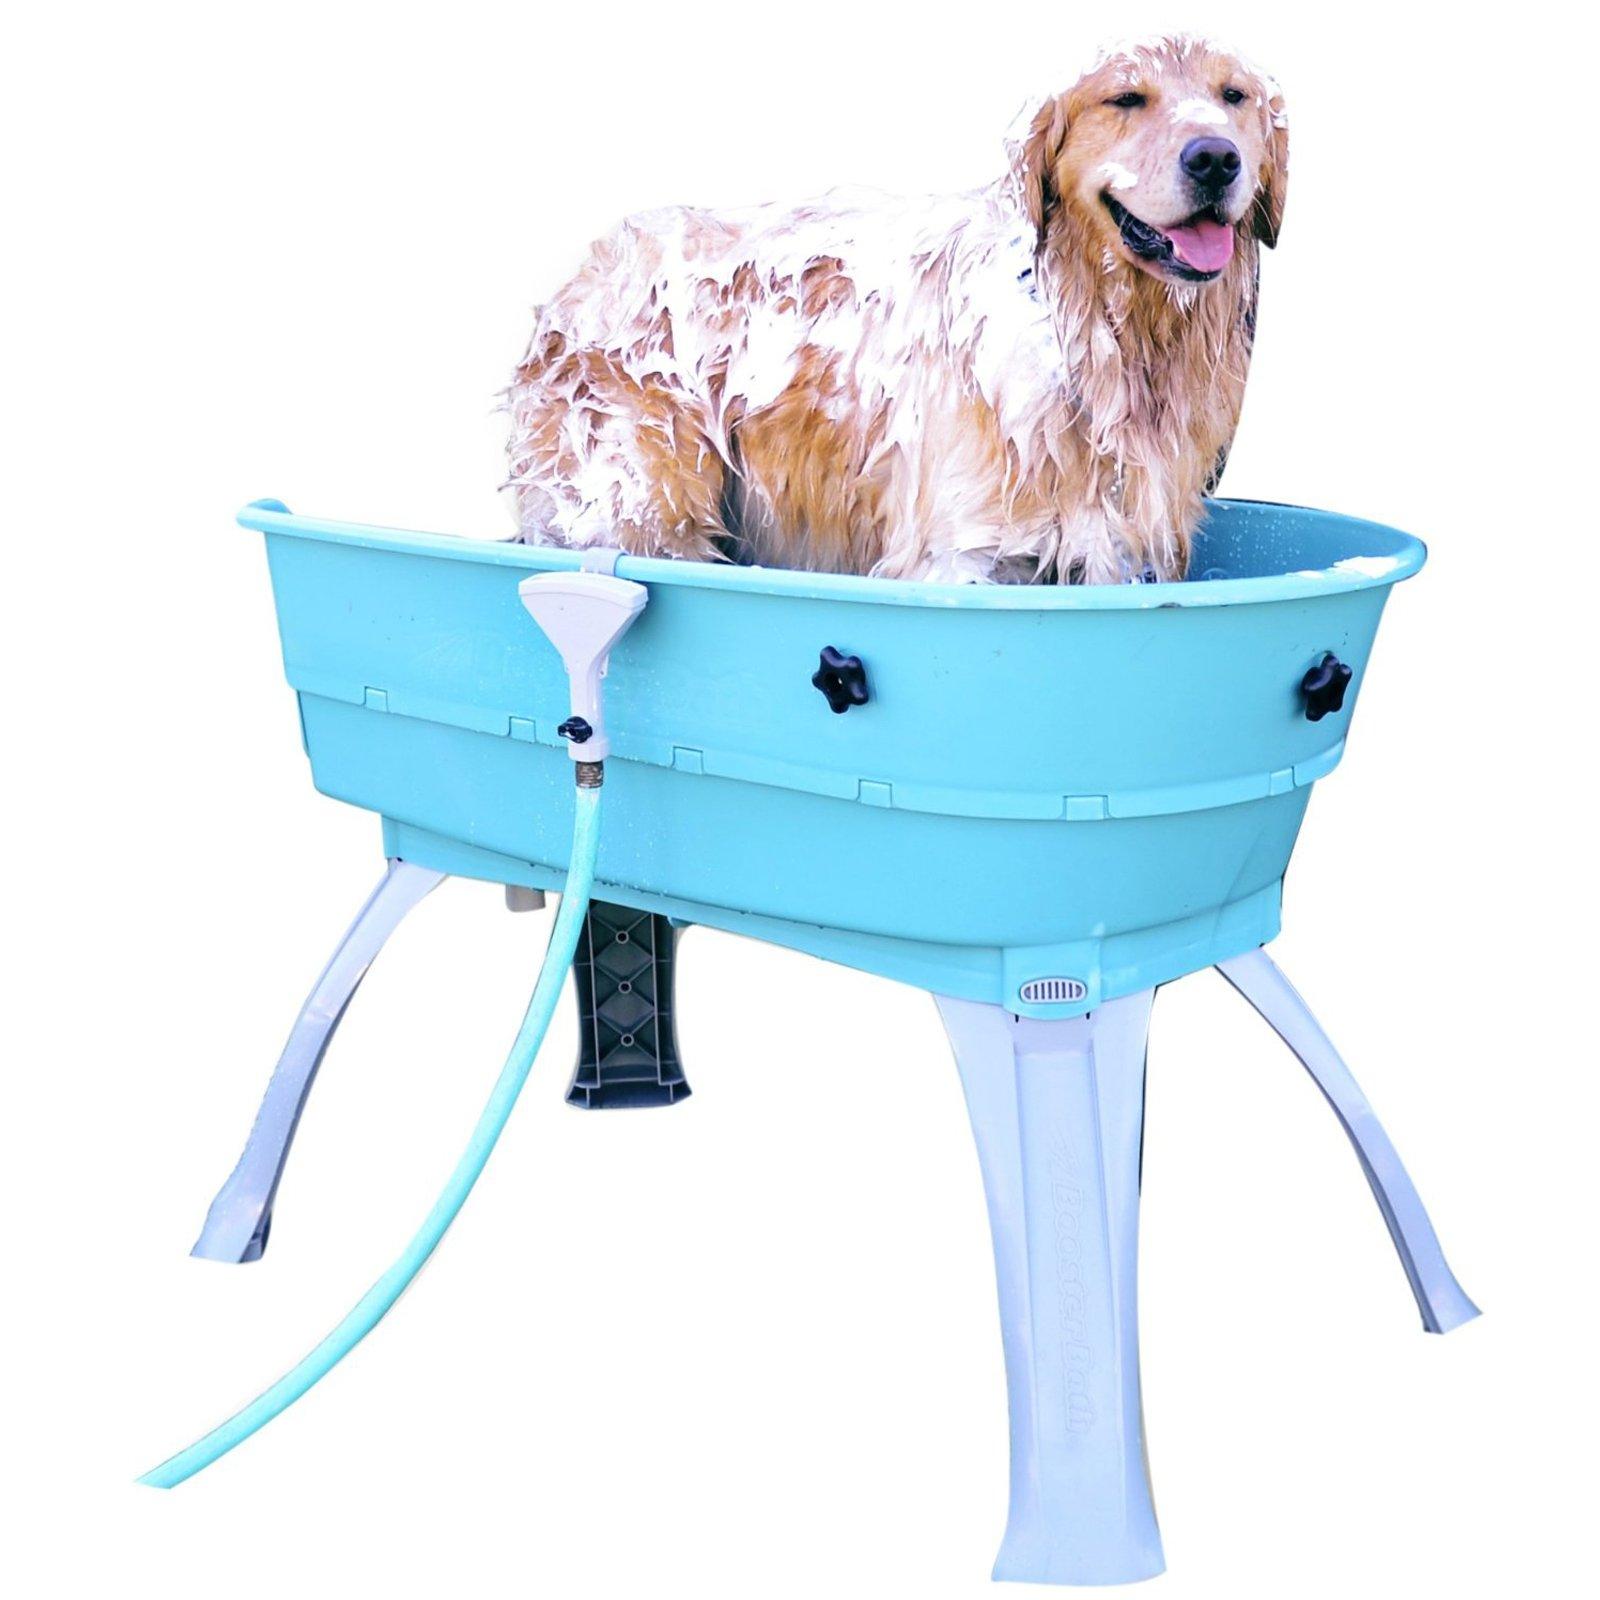 Booster bath outdoor dog washing station medium pet tub golden retriever happy in a booster bath solutioingenieria Images